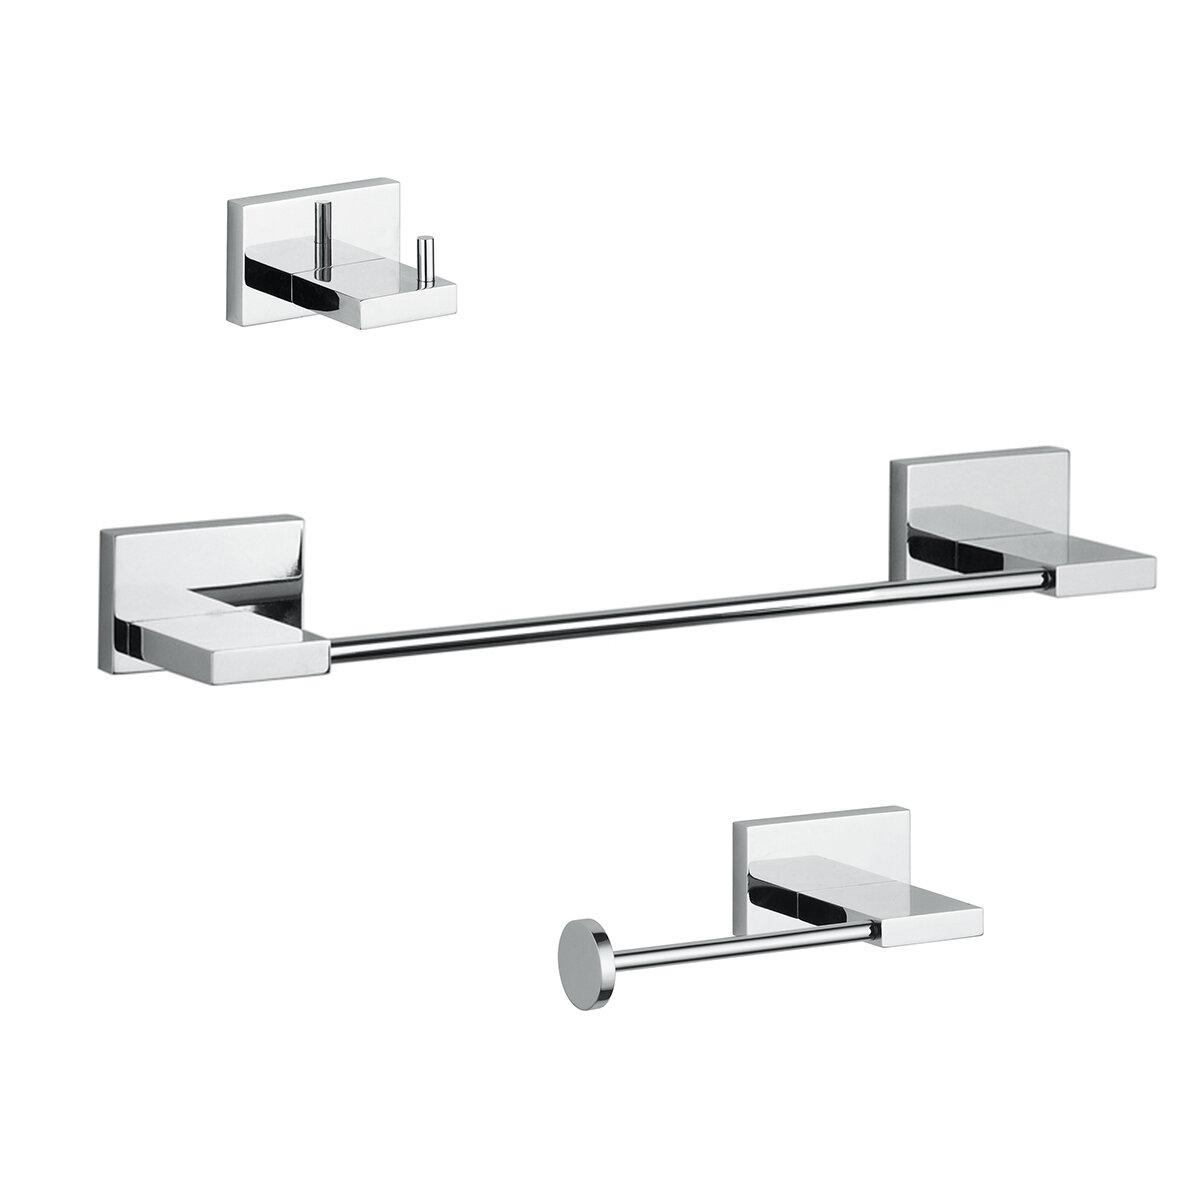 WS Bath Collections Carmel 3 Piece Bathroom Hardware Set & Reviews ...